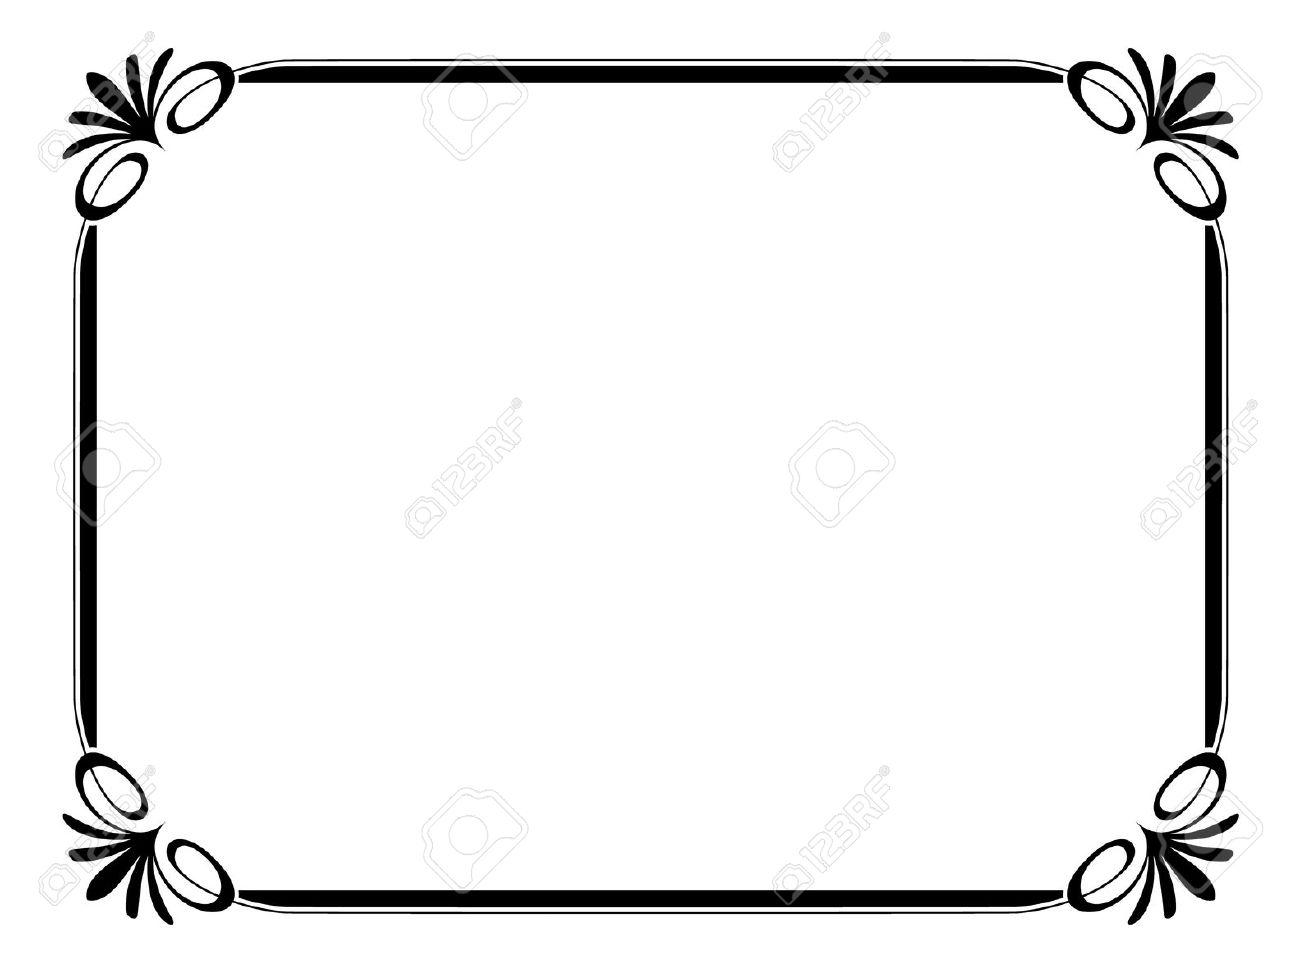 1300x973 Certificate Frames Clipart